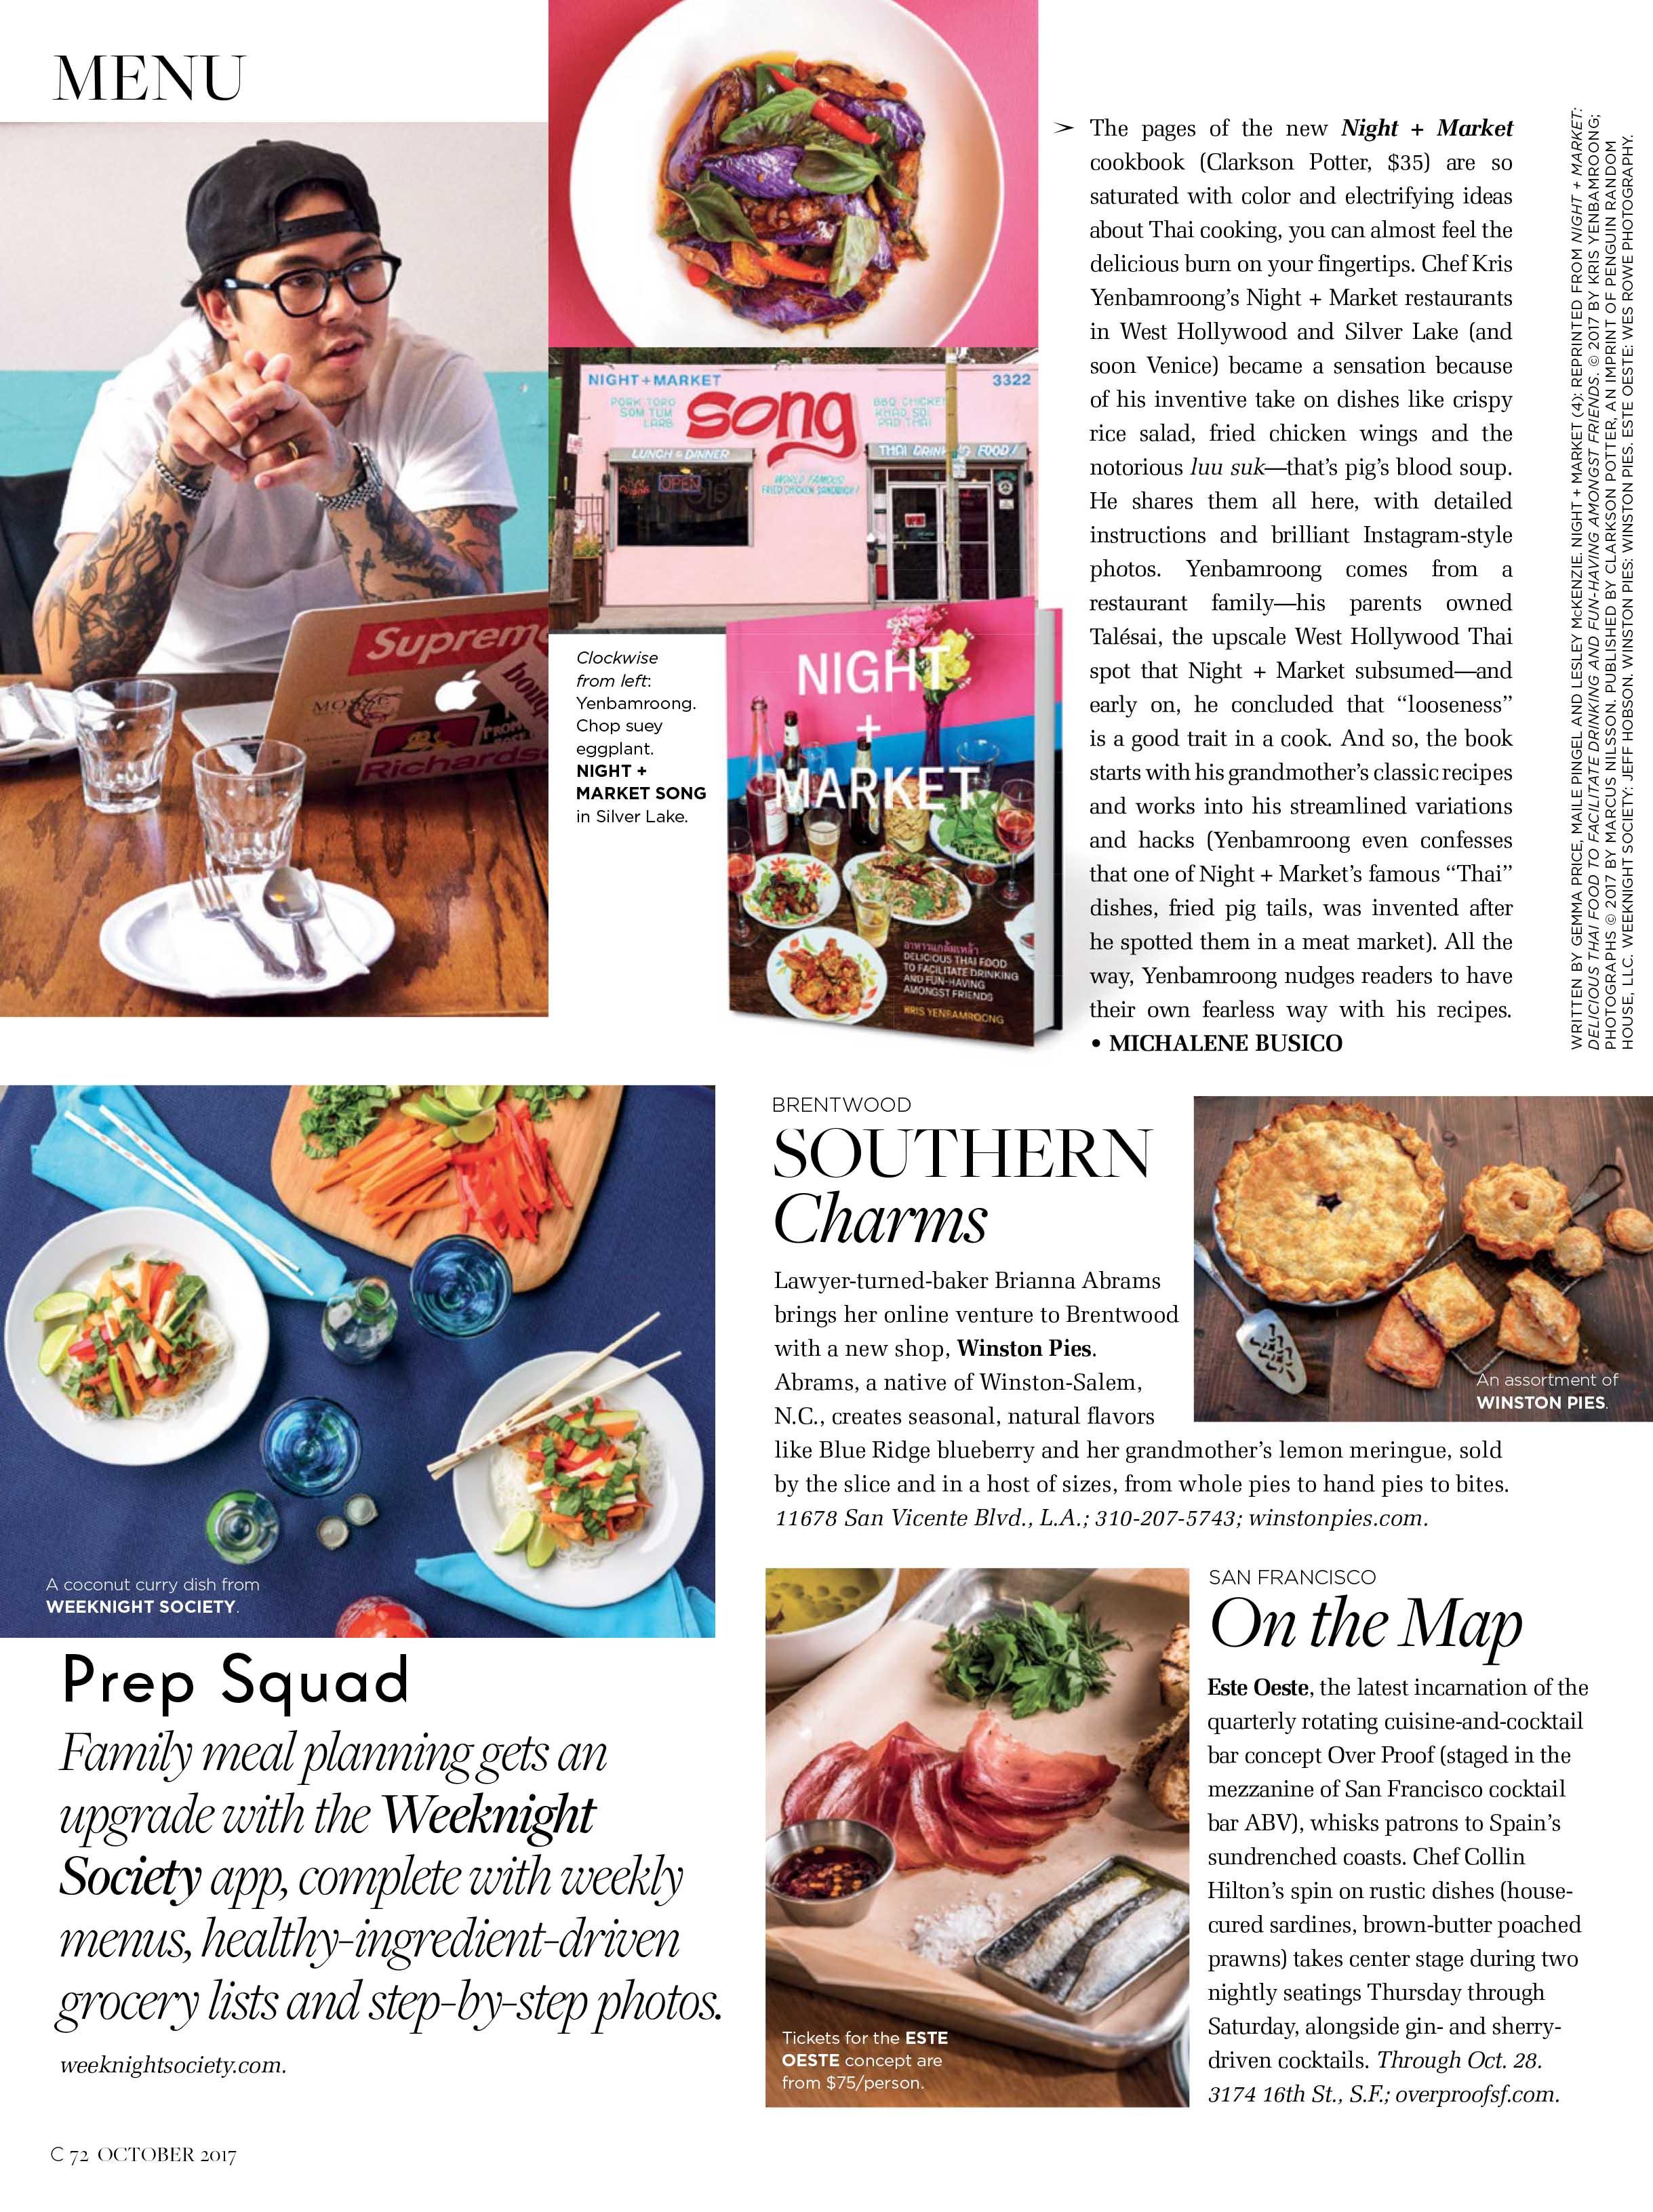 C Magazine Spread.jpg